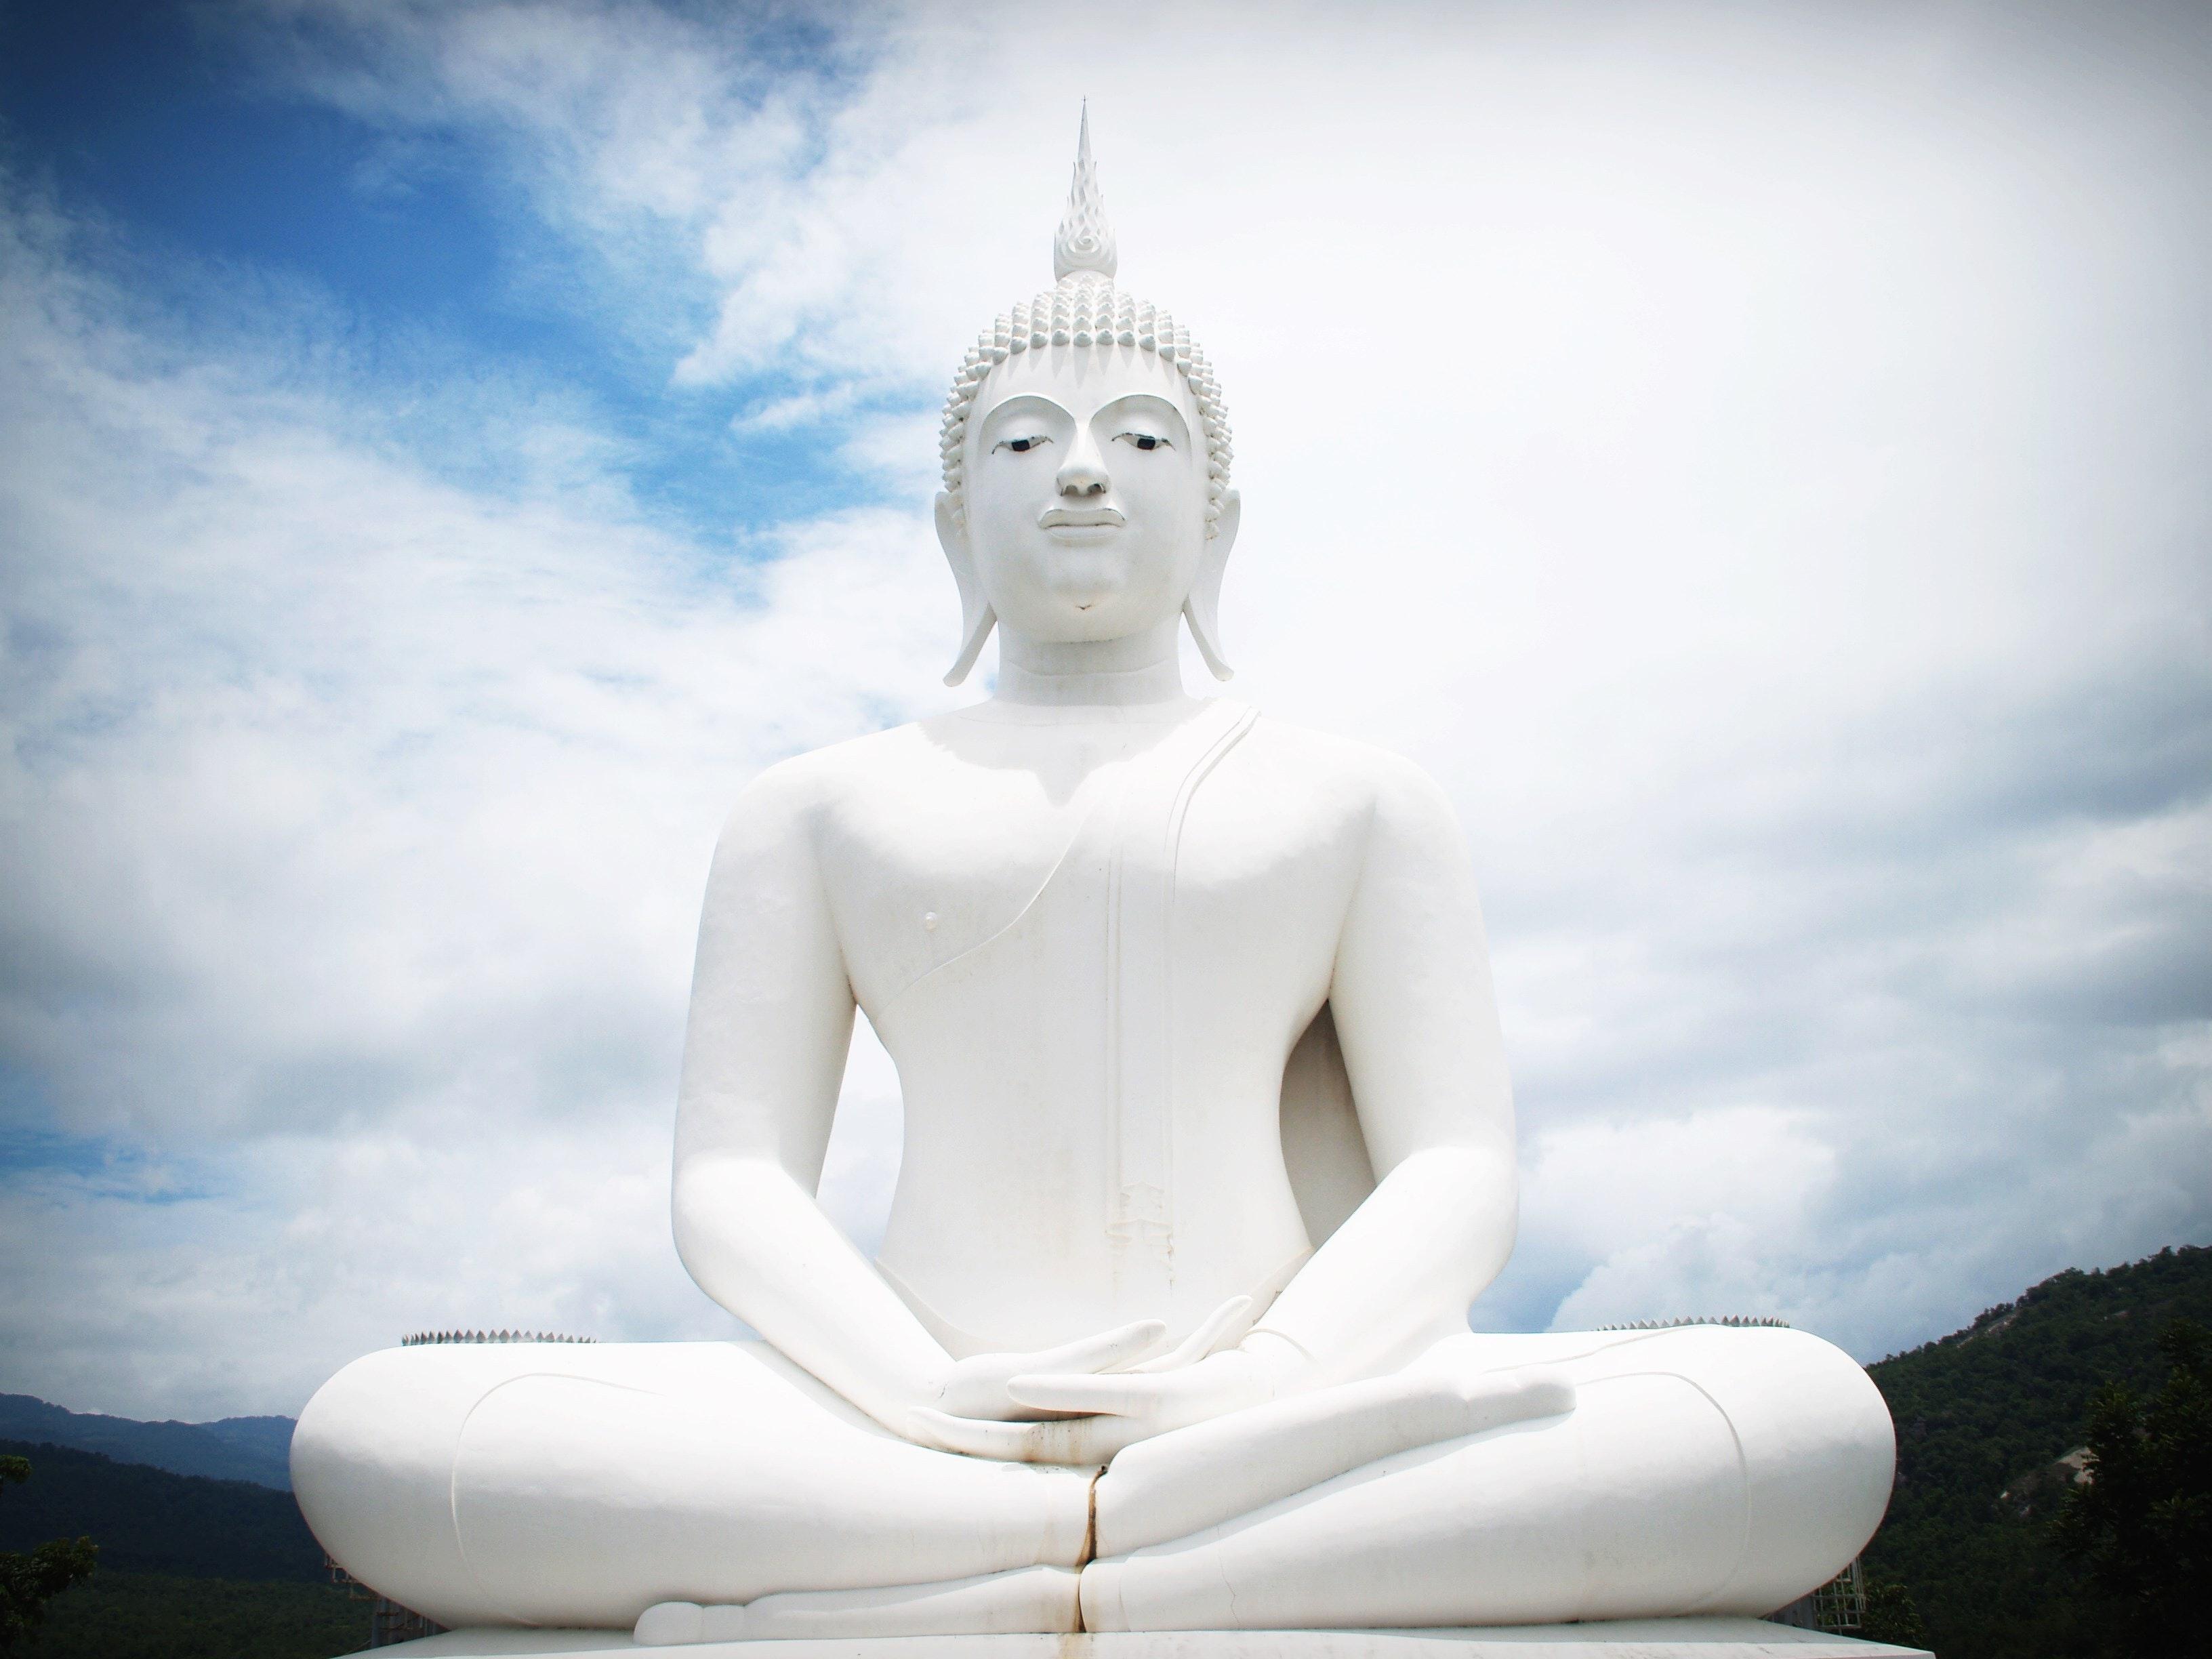 White Concrete Buddha Statue, Ancient, Serenity, Pray, Prayer, HQ Photo